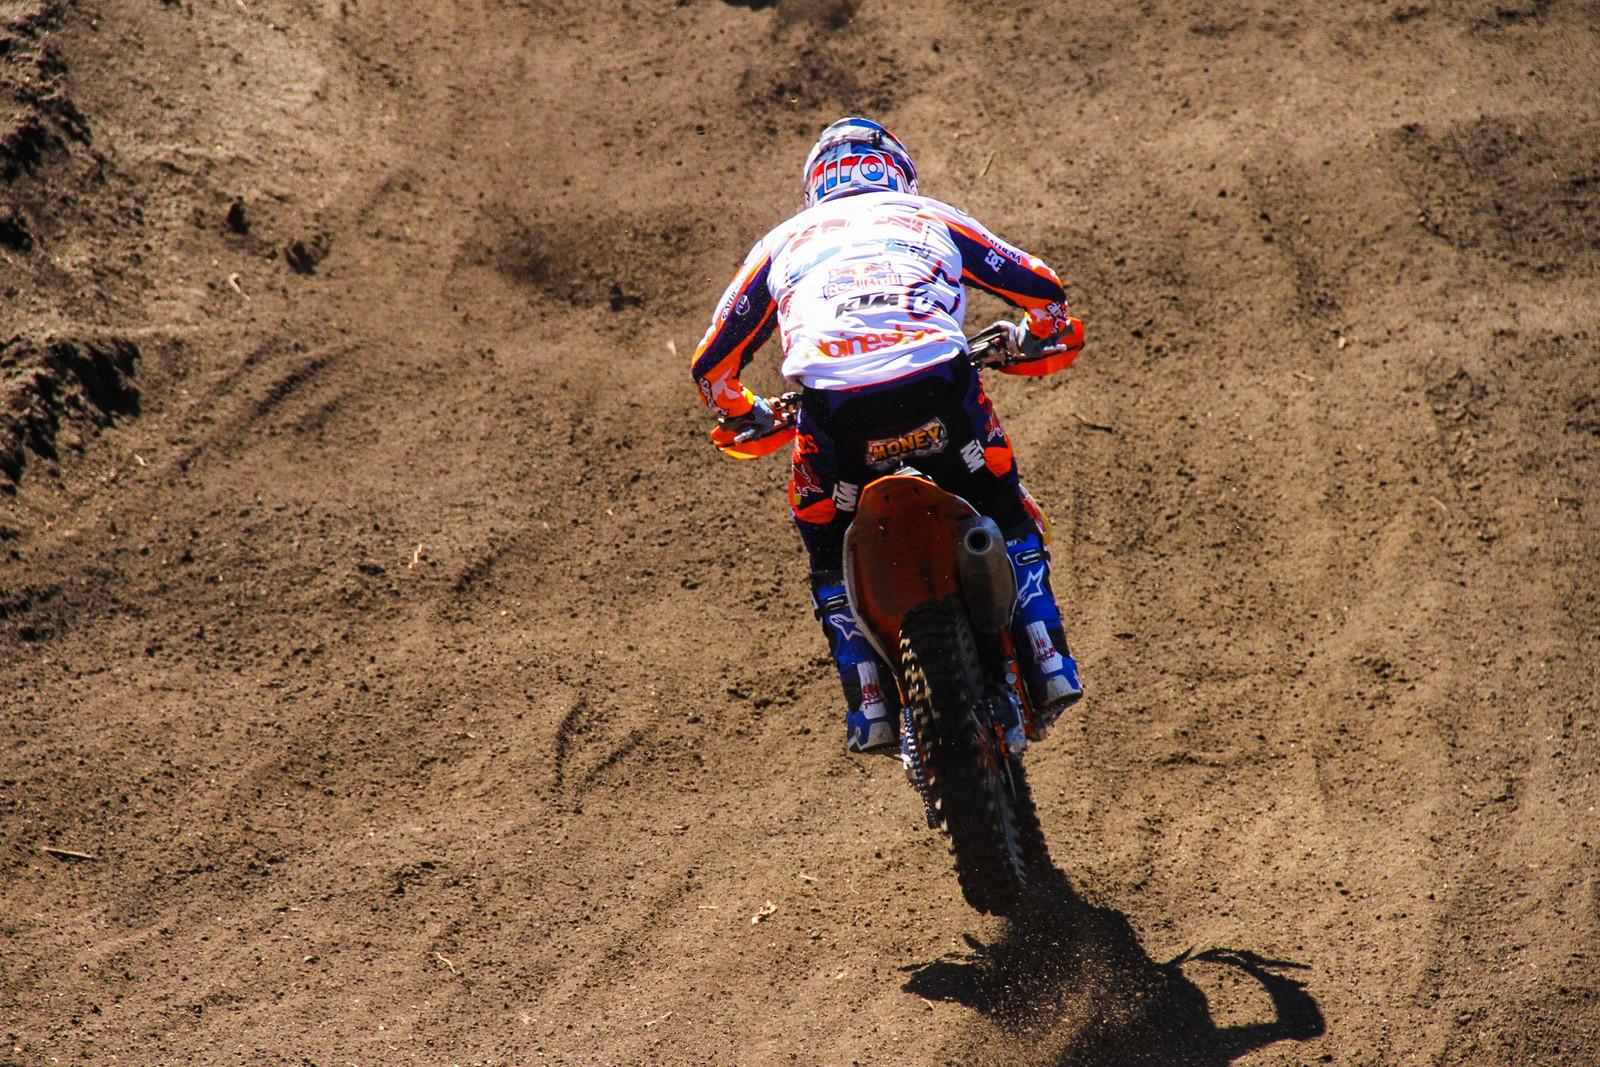 Jeffrey Herlings - Photo Blast: 2017 MXGP of Argentina - Motocross Pictures - Vital MX